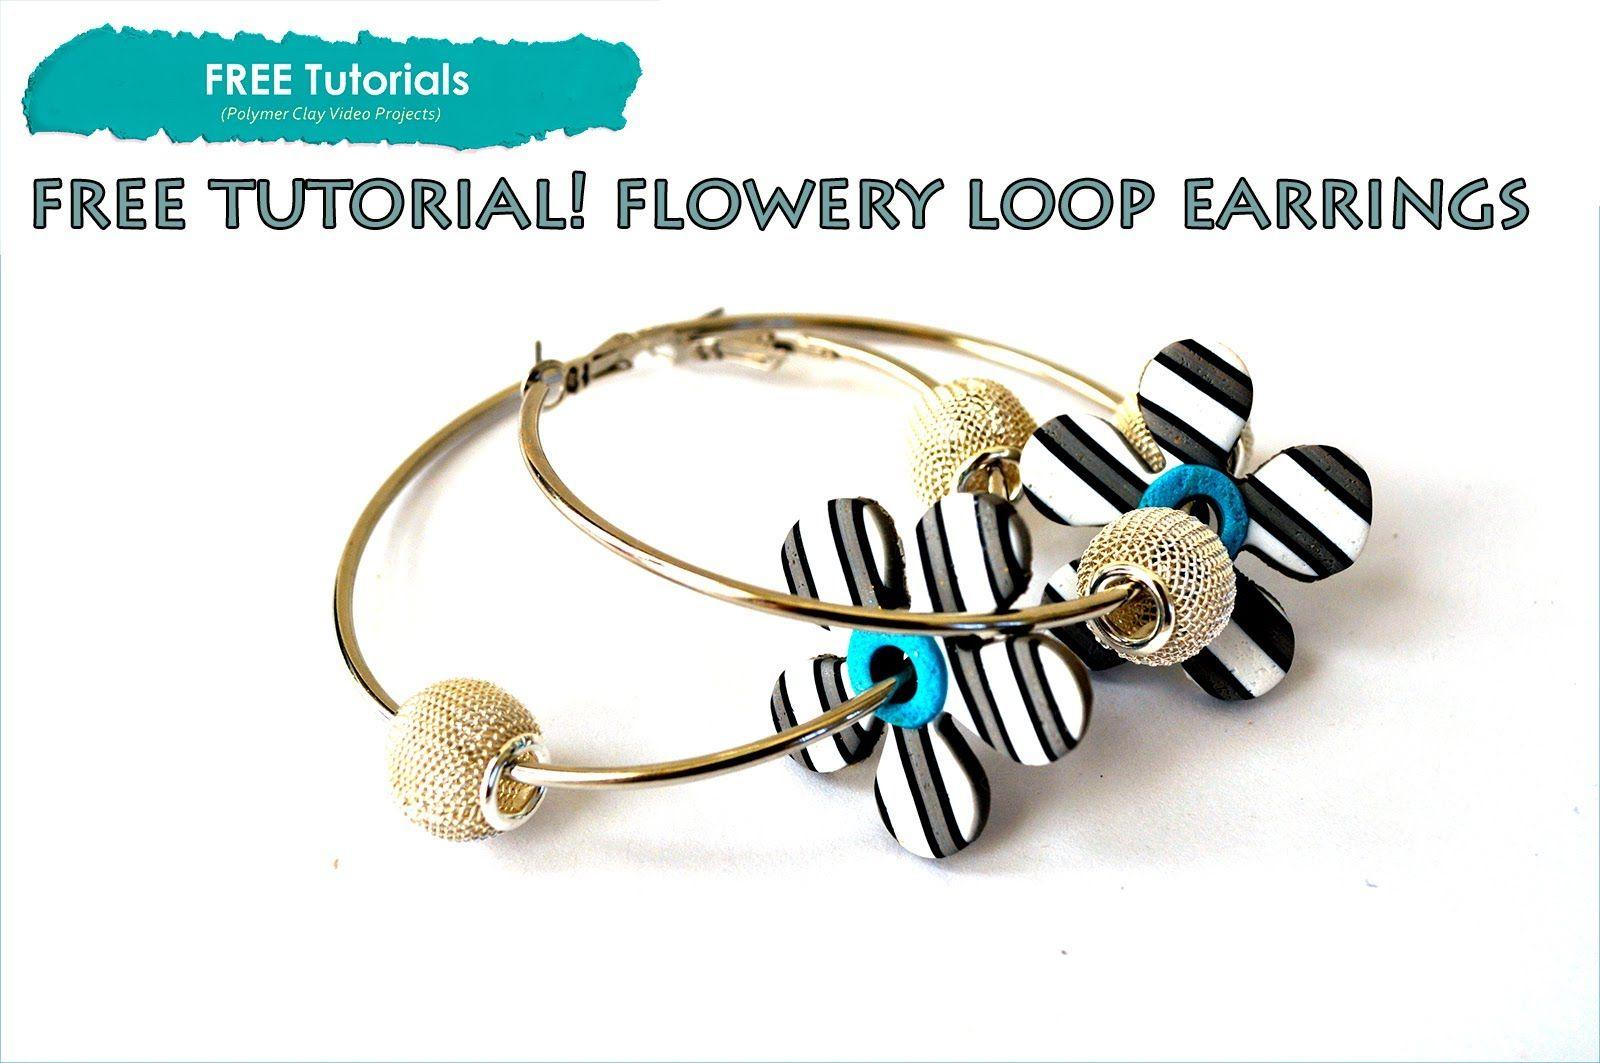 PolyPediaOnline TV - FREE How to Polymer Clay Flower Loop Earrings Proje...